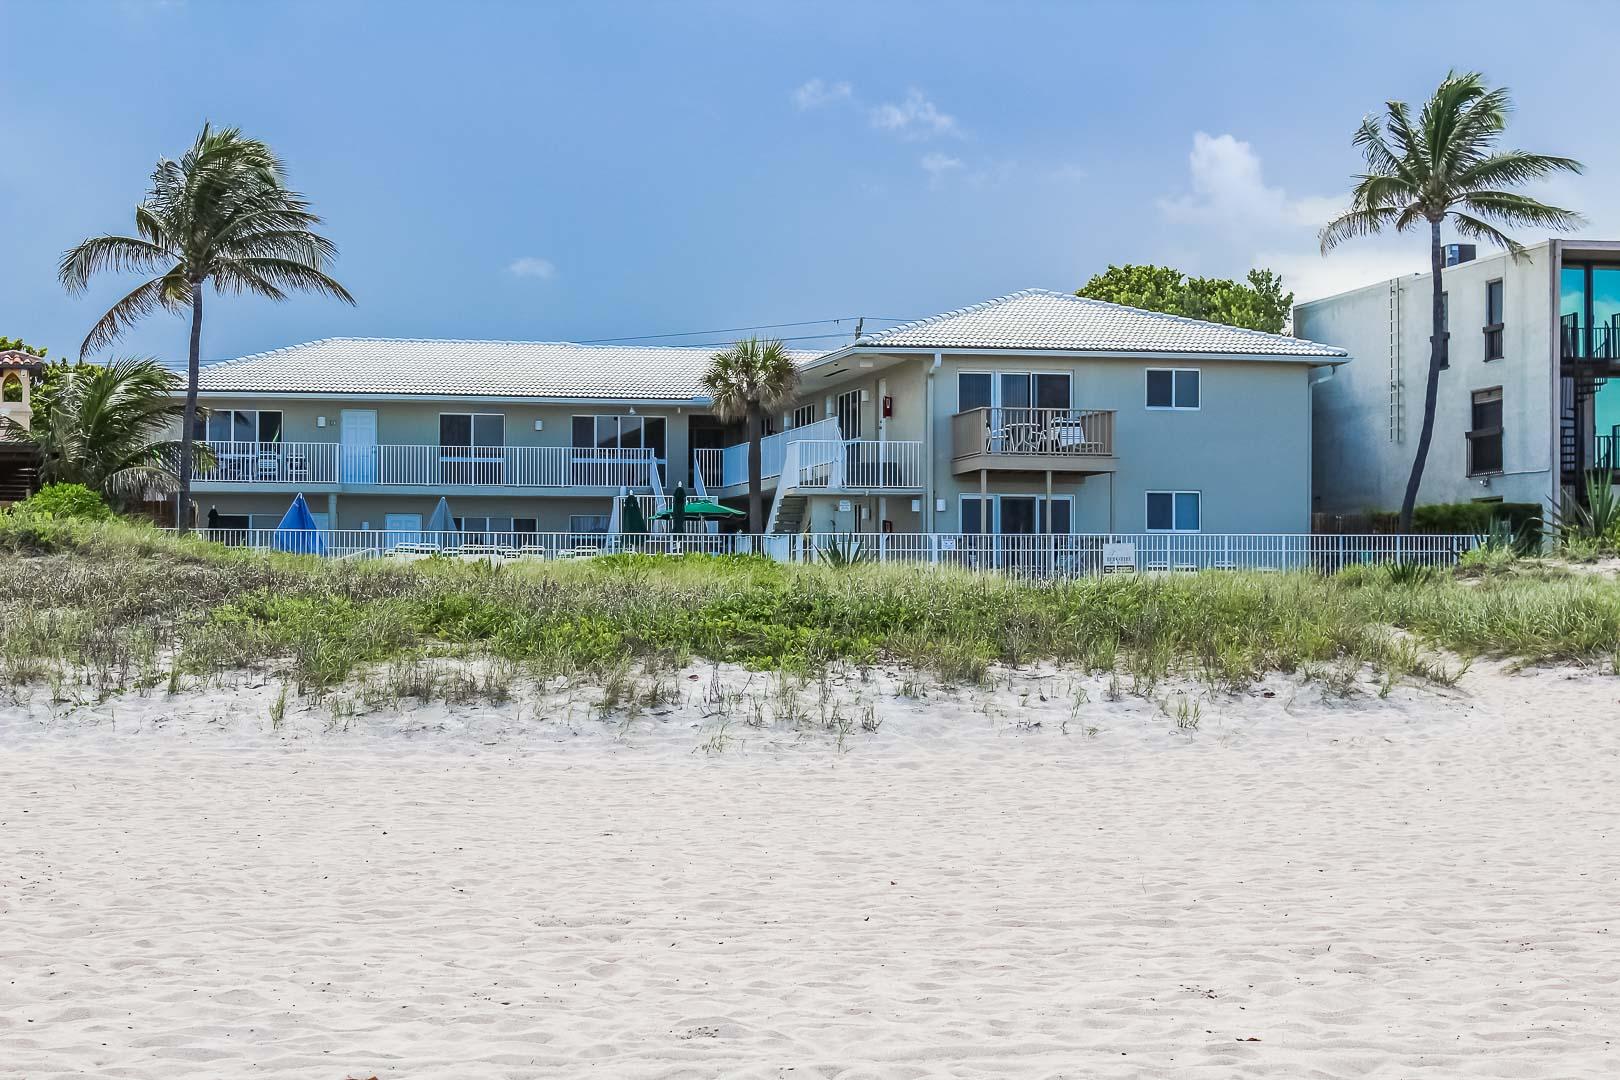 A charming view of VRI's Berkshire Beach Club in Florida